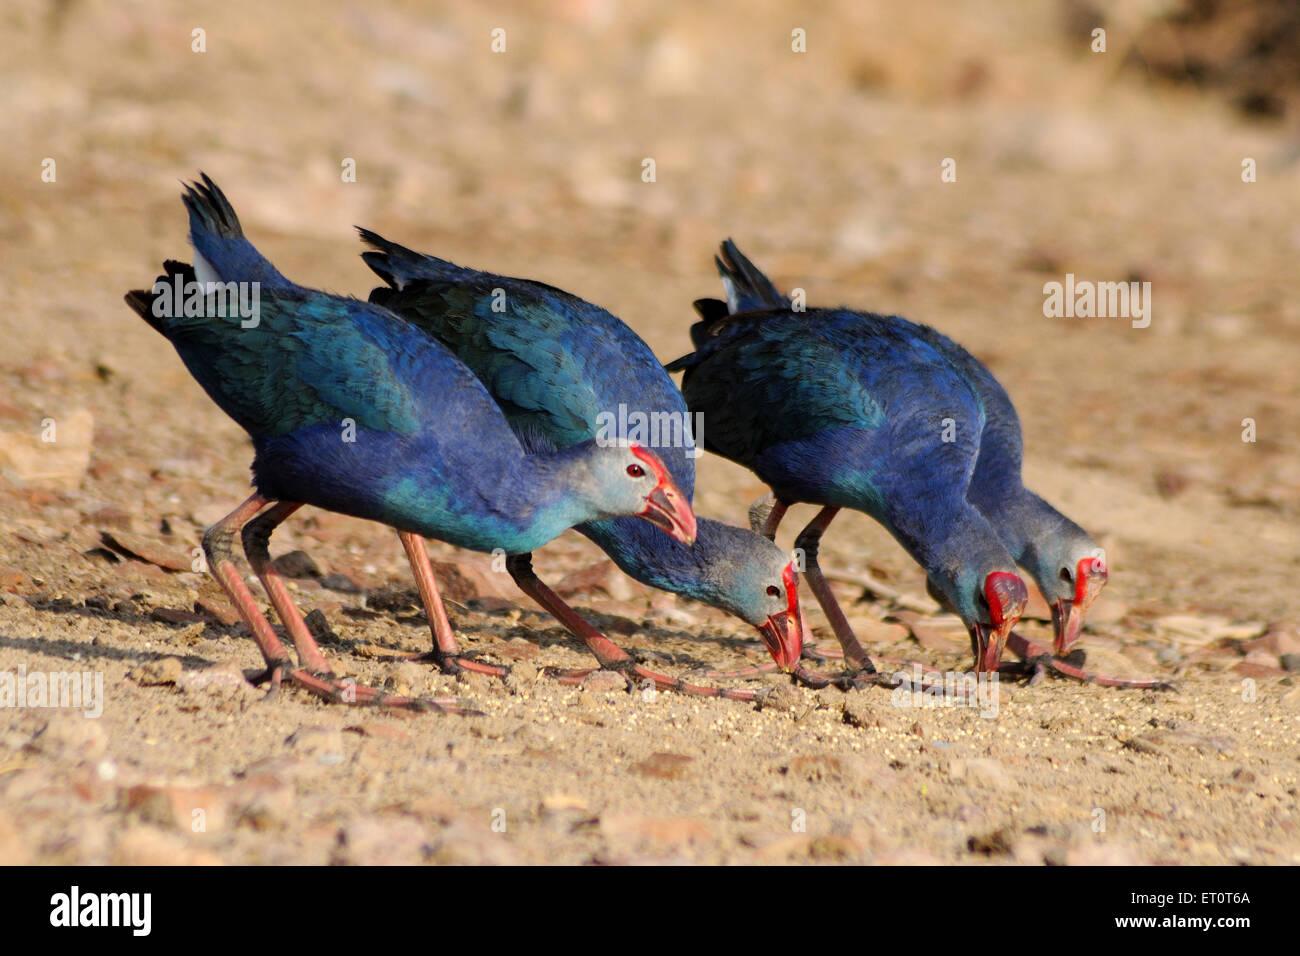 Gli uccelli ; viola moorhen Porphyrio porphyrio a Jodhpur ; Rajasthan ; India Immagini Stock